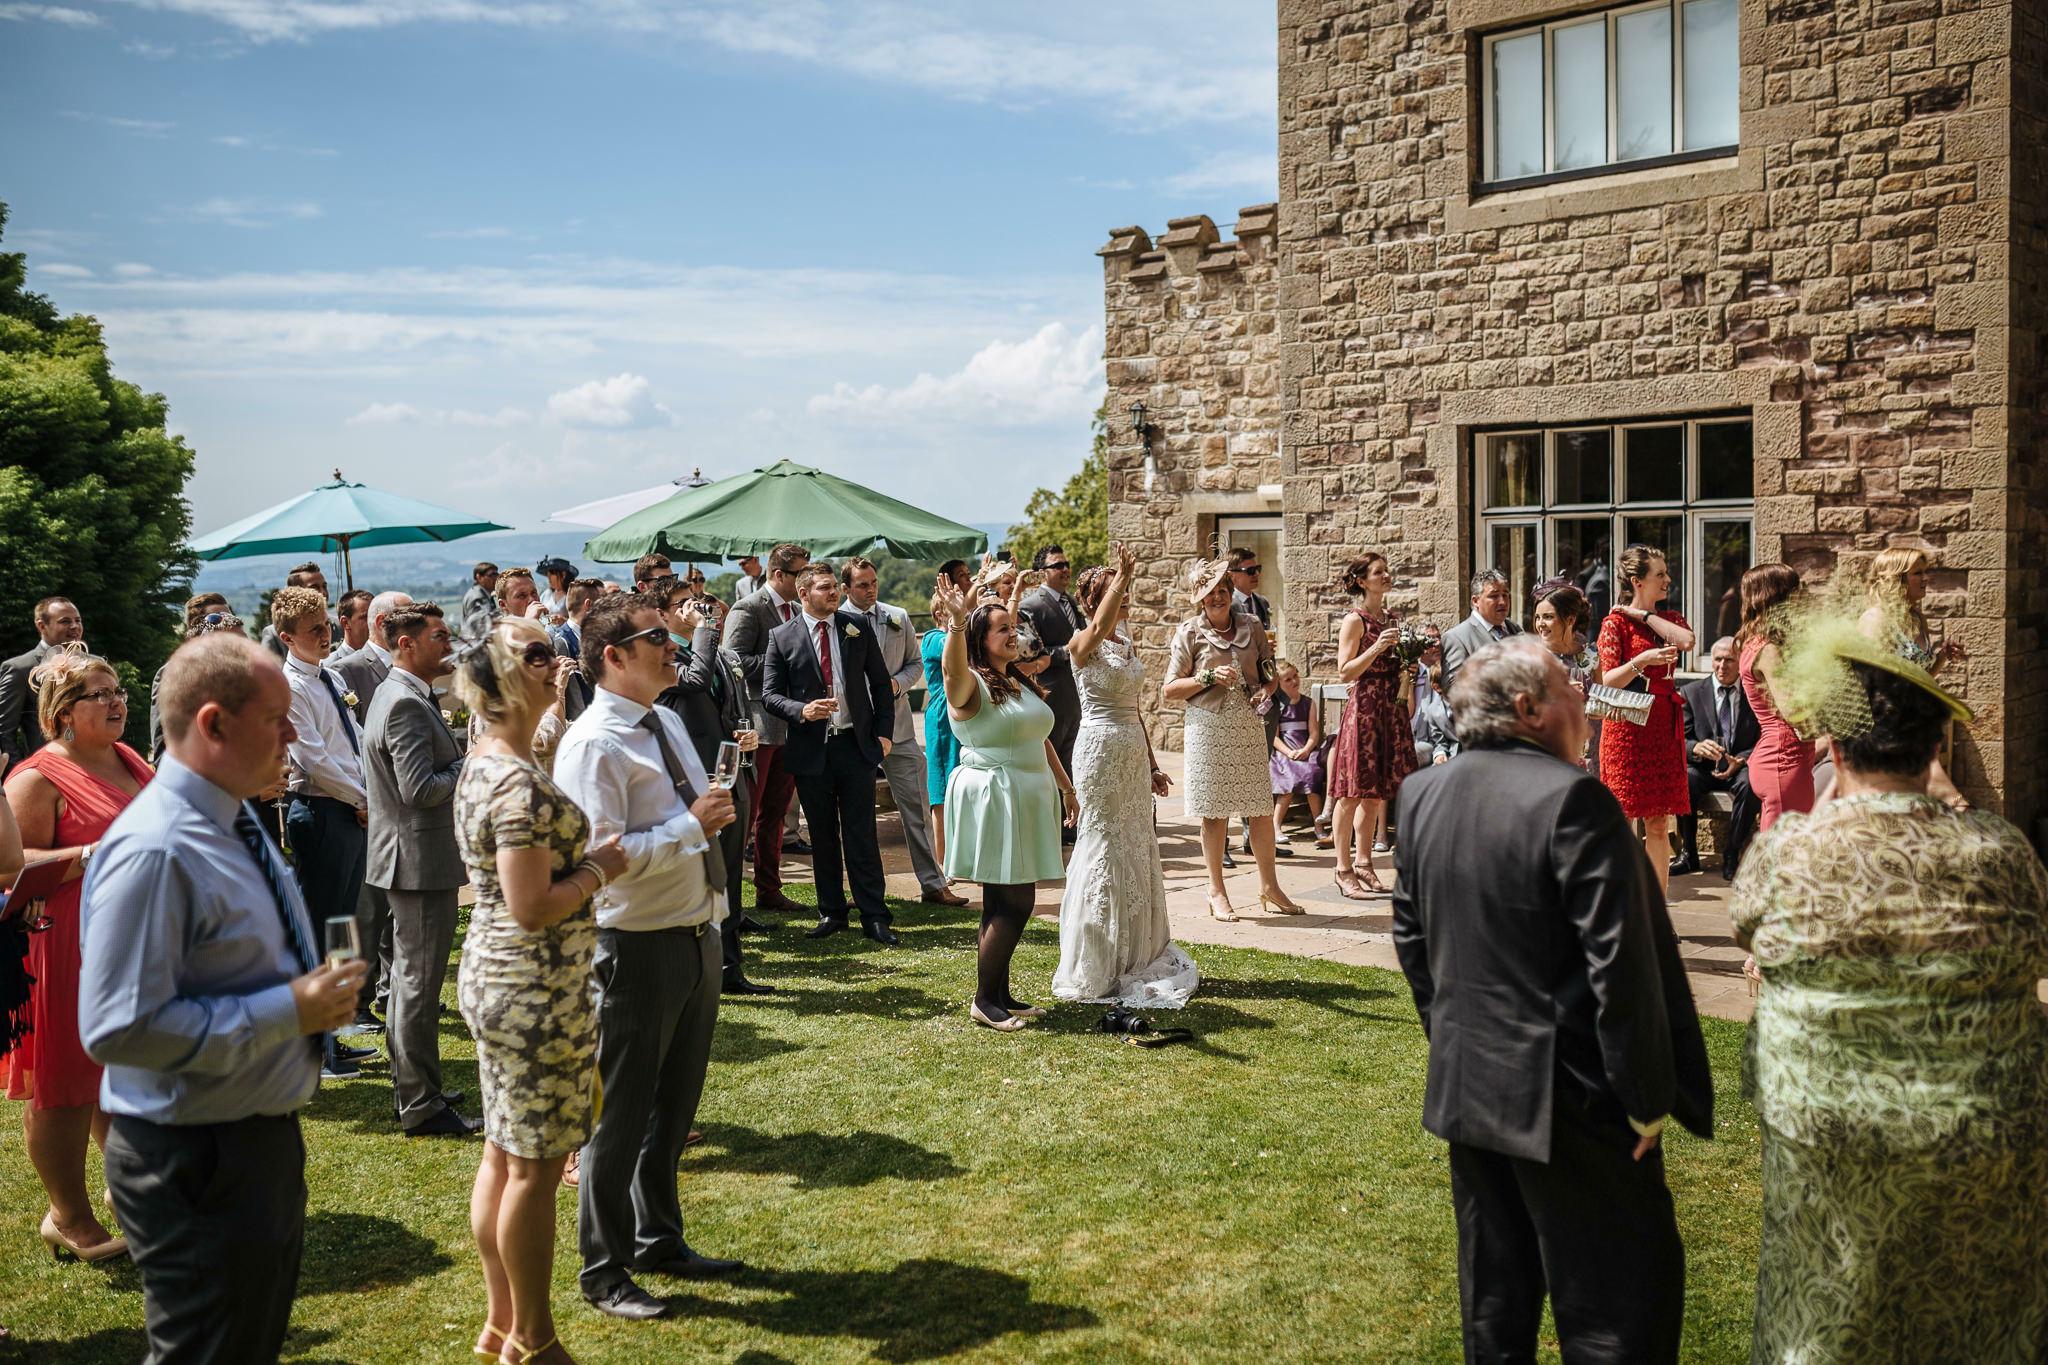 paul-marbrook-Caer-Llan-Wedding-Photographer-90056